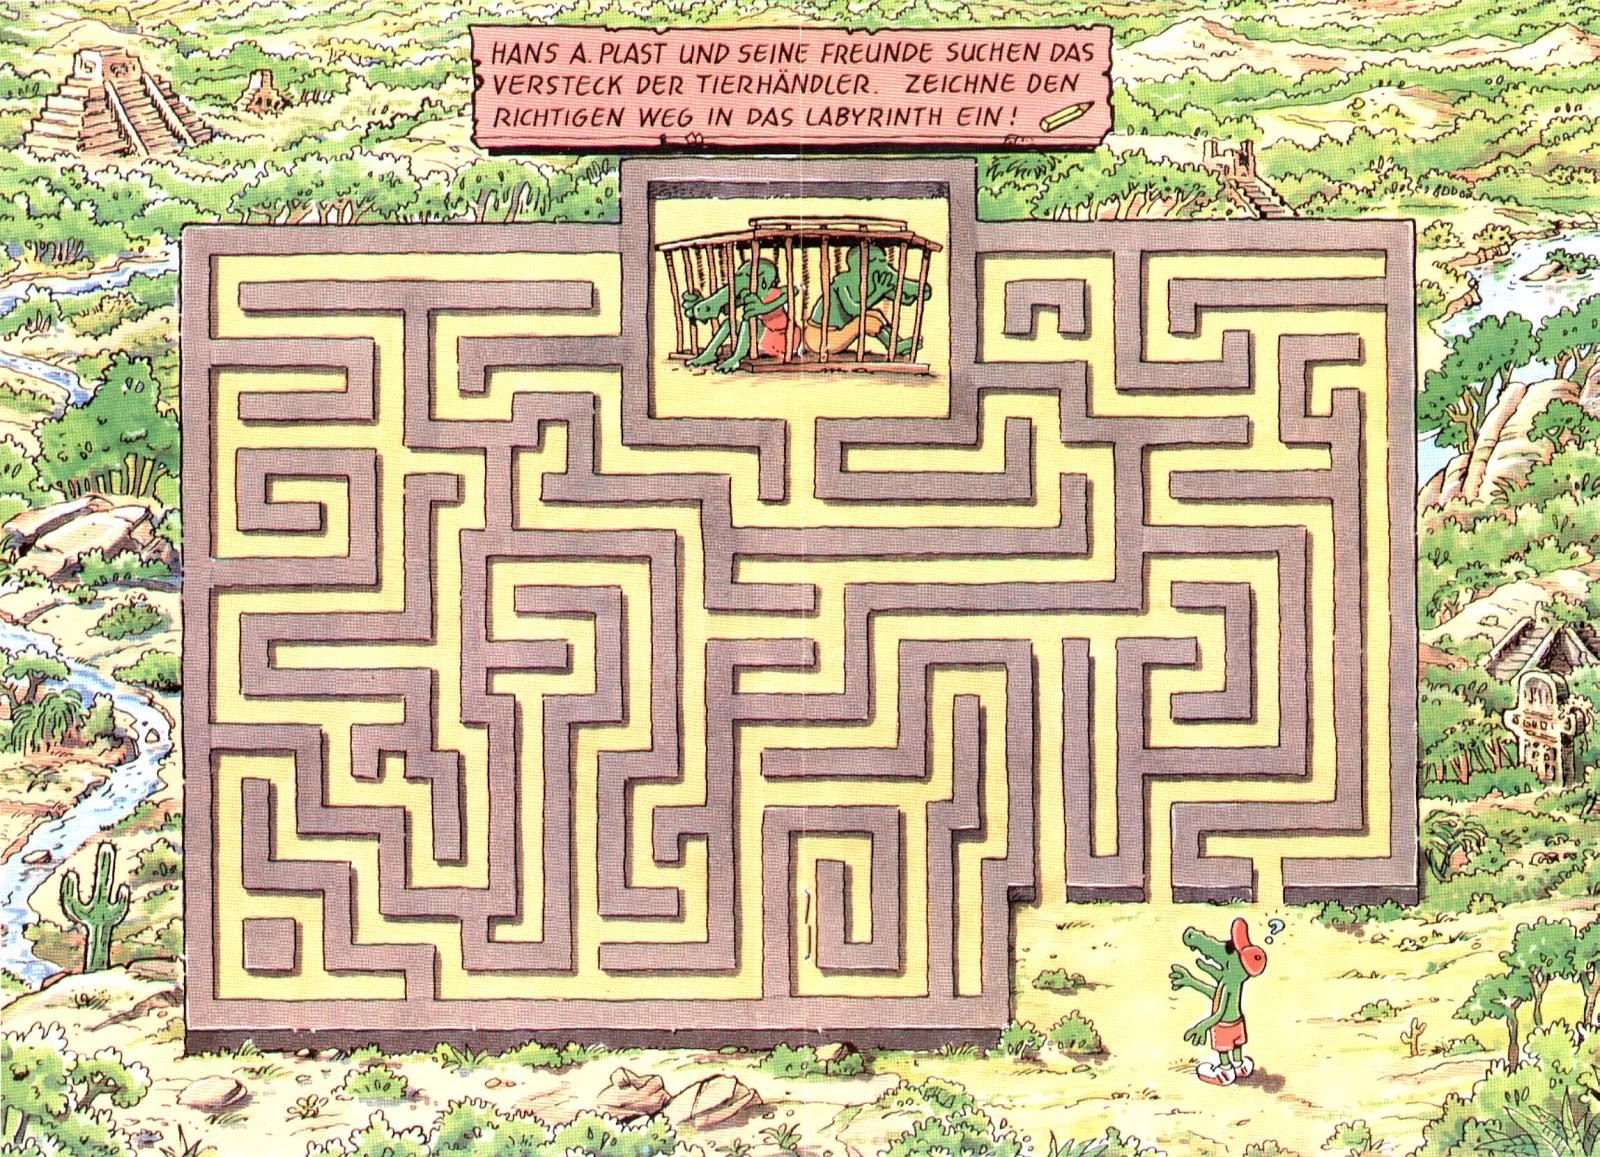 Markenwerbung, Kinderpflaster, Comic, Labyrinth, Grafik, Fred Fuchs, Autor, Robert Welz, Texter, Weihnachten, Drogeriemarkt